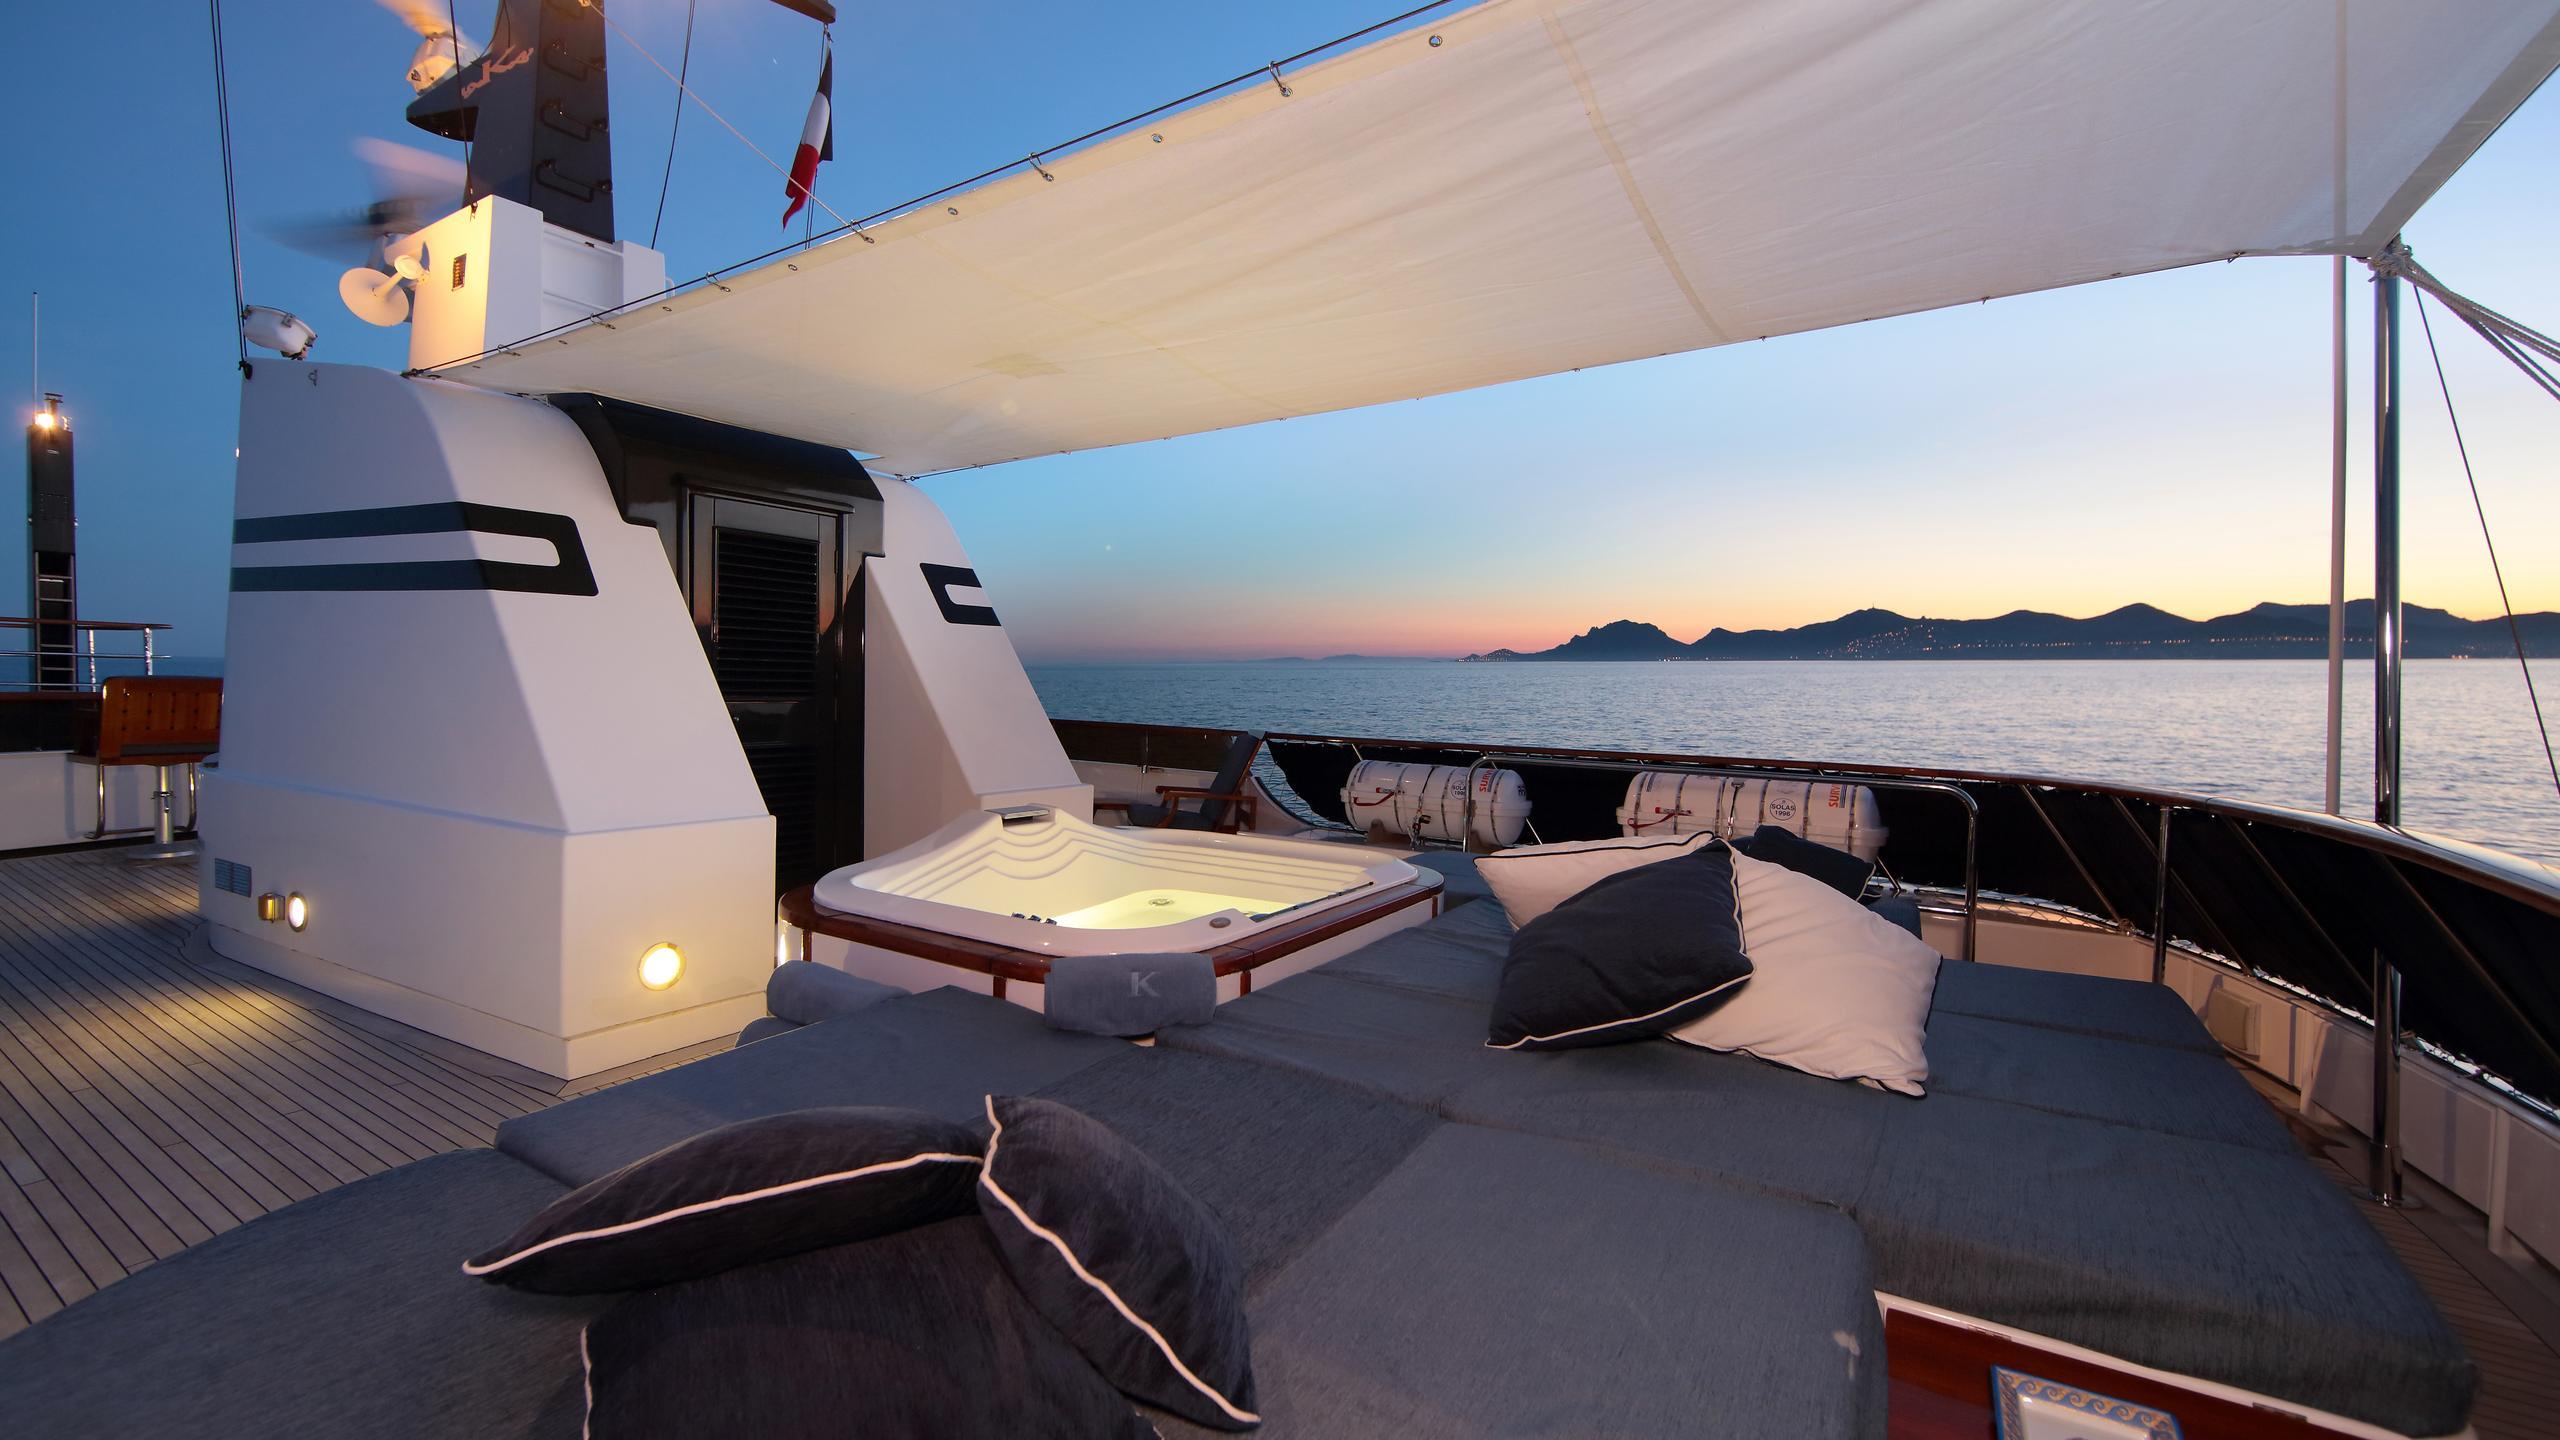 kirkland-yacht-sun-lounger-night-time